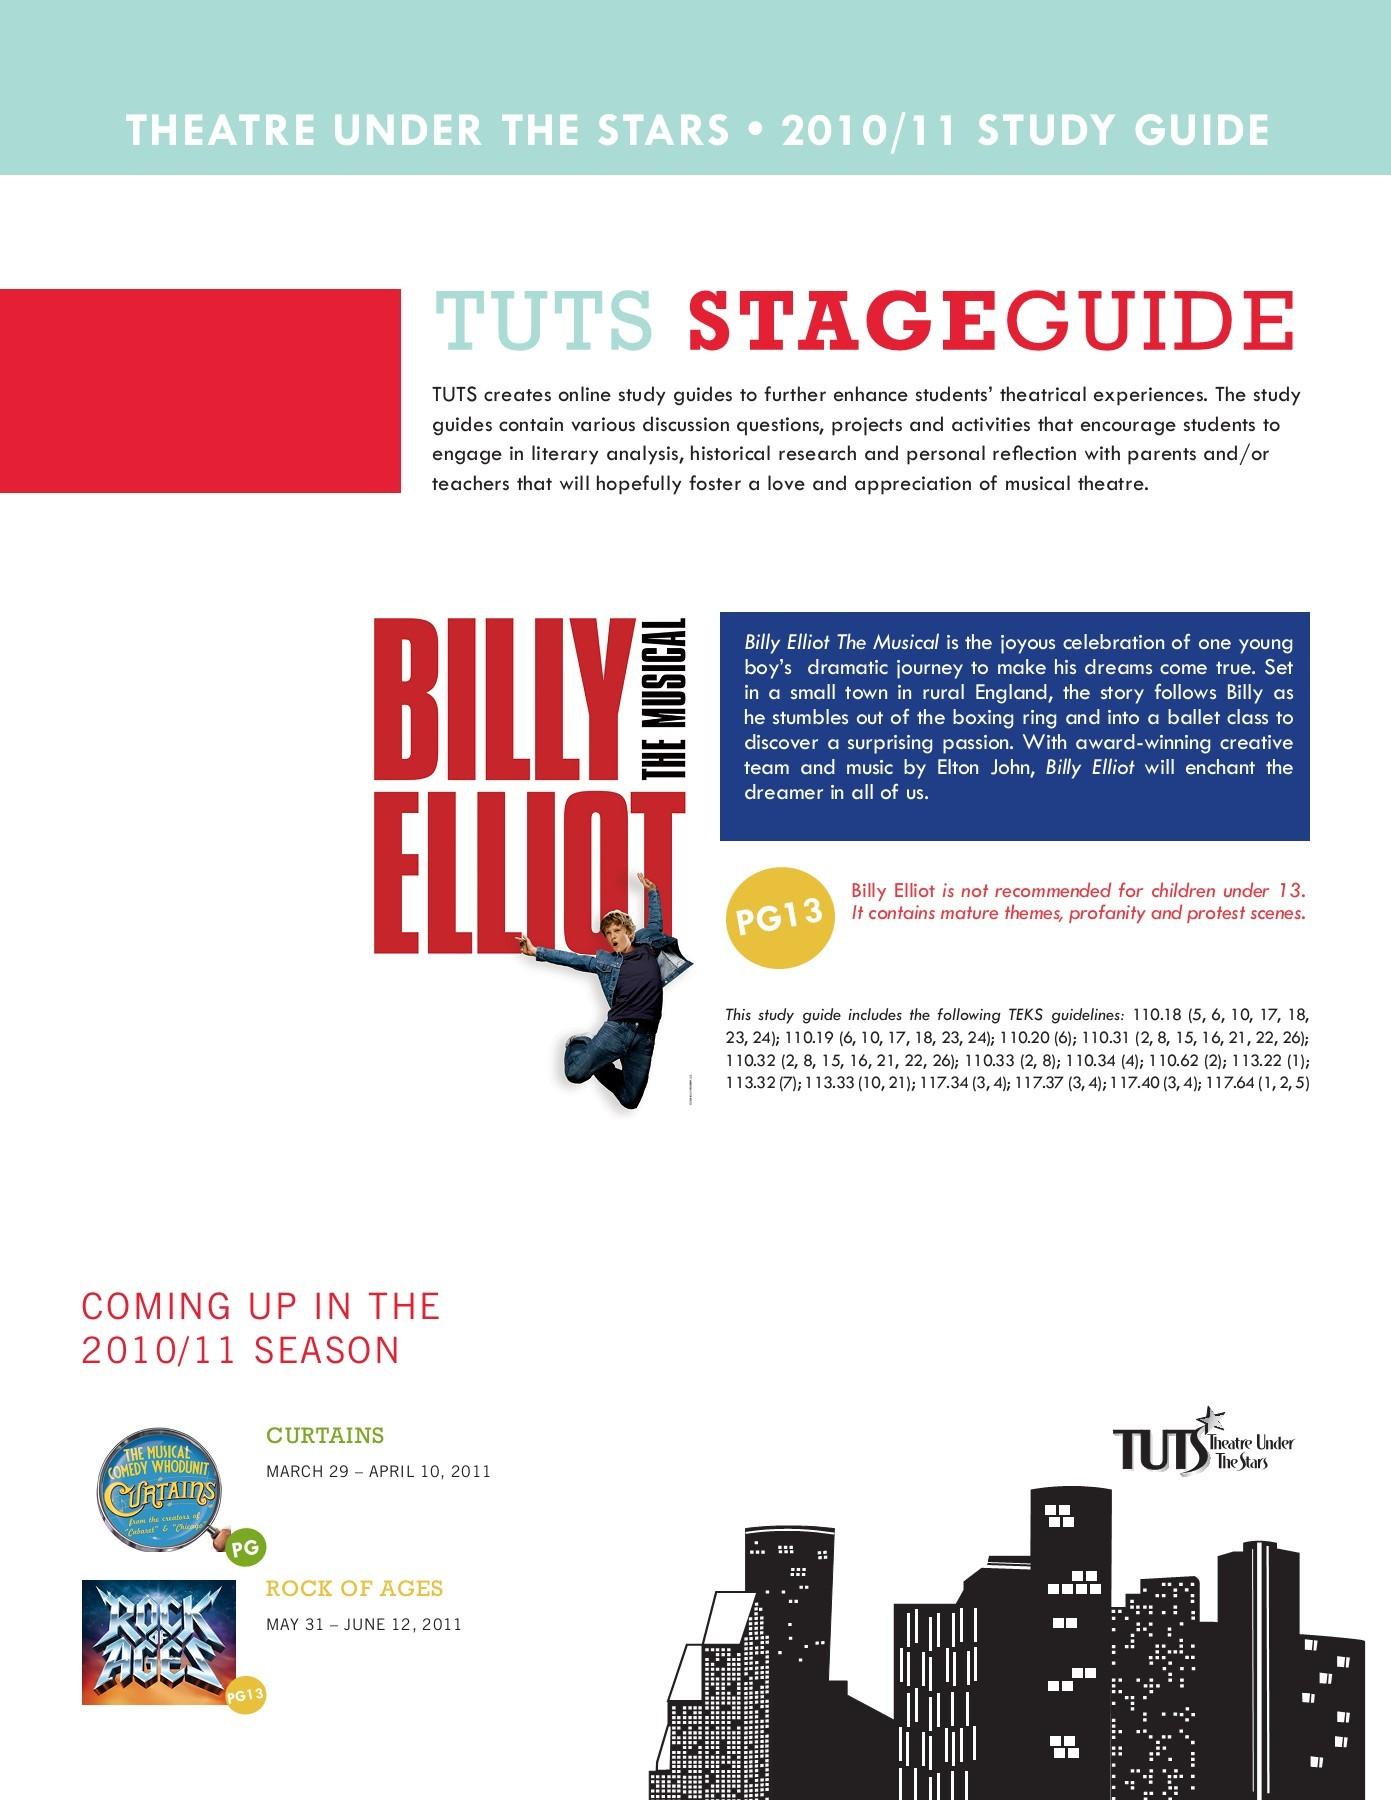 Billy Elliot Boxing Sceneysis